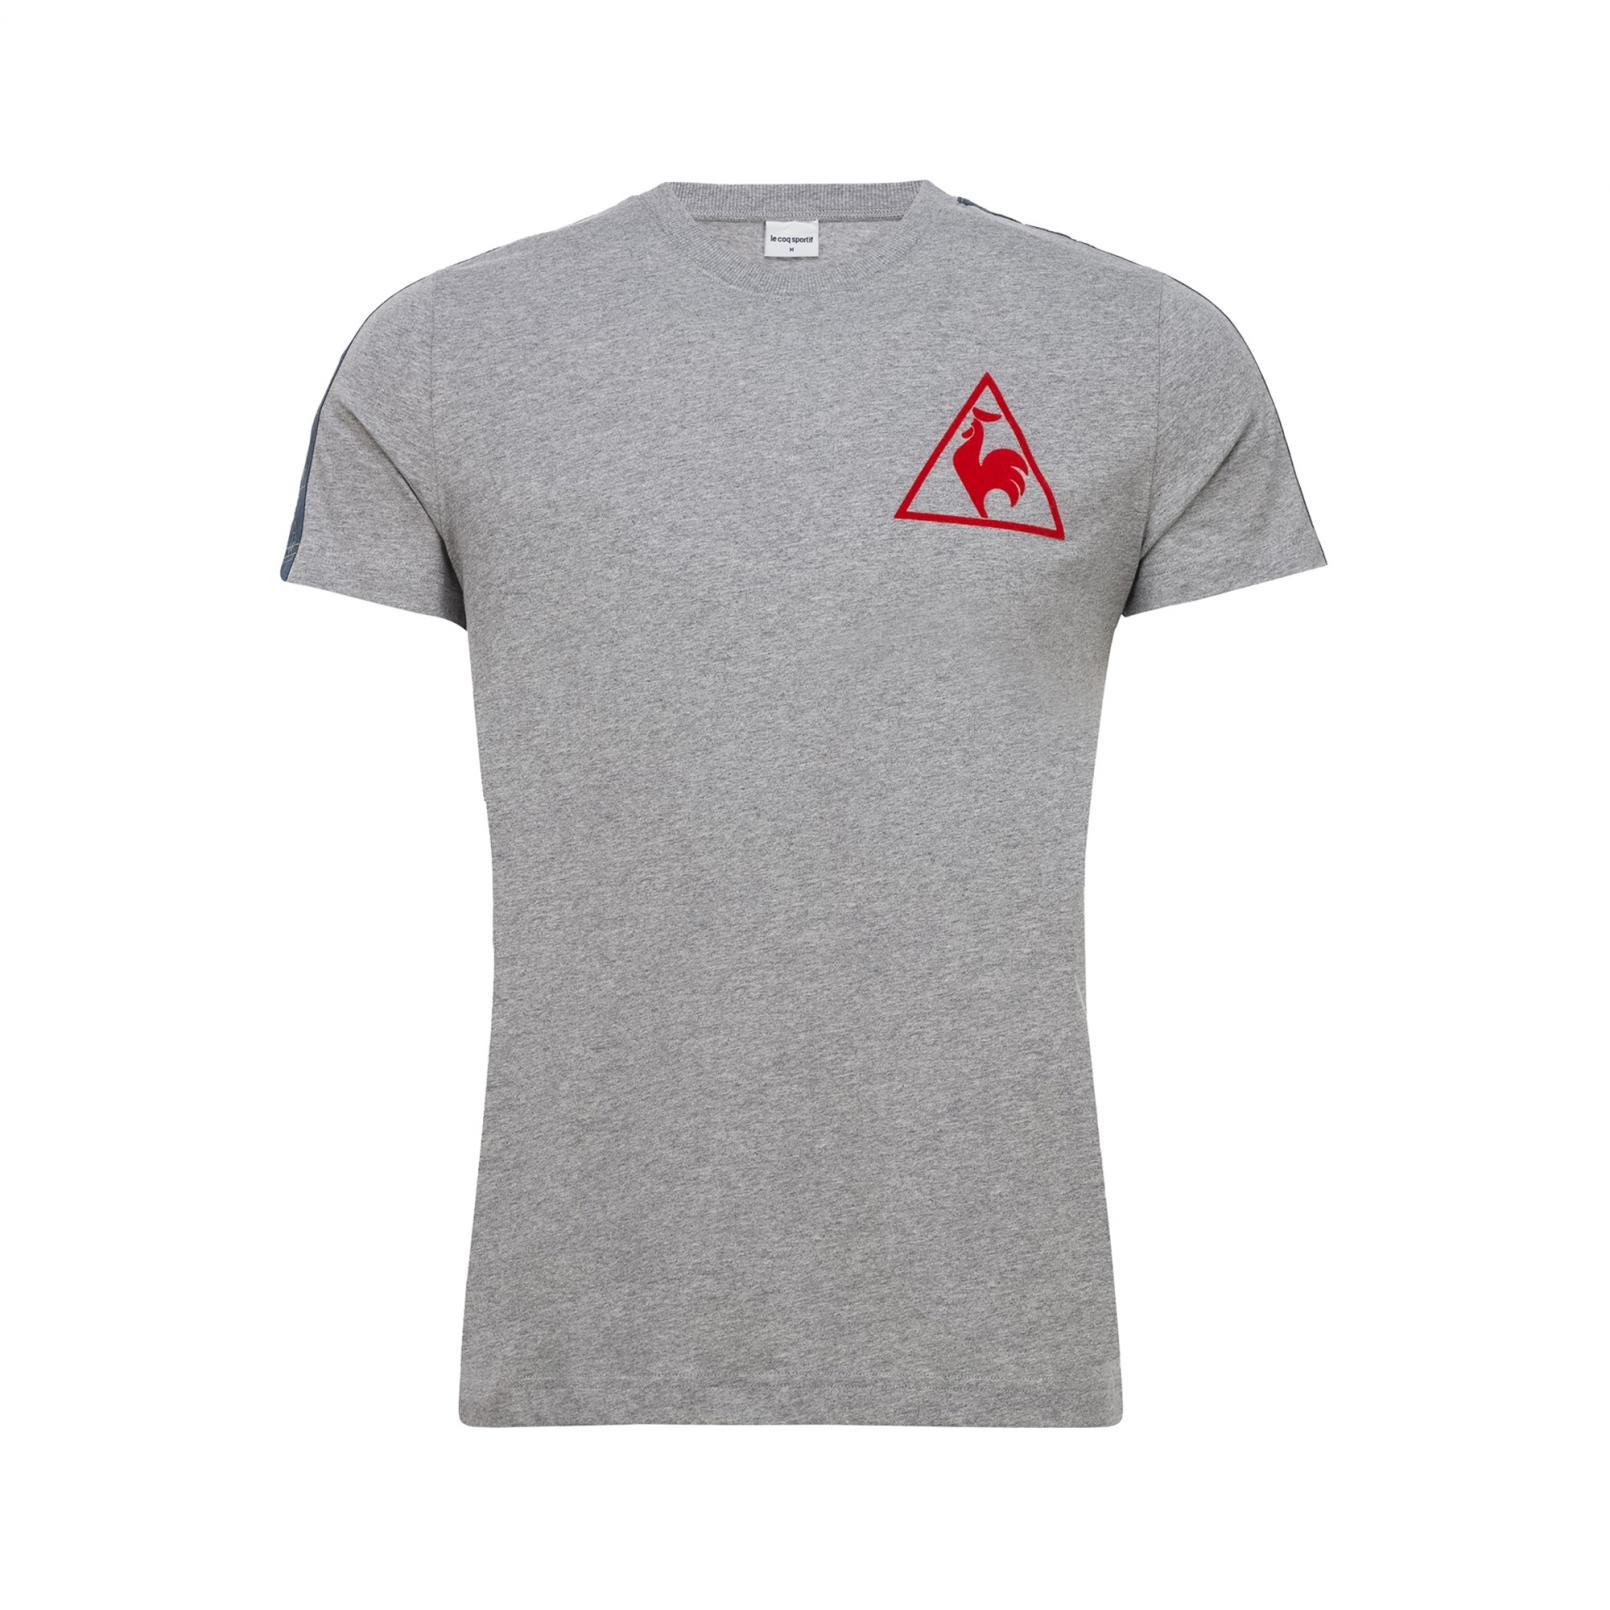 T-shirts – Le Coq Sportif Tricolore Football T-shirt Grey/Blue